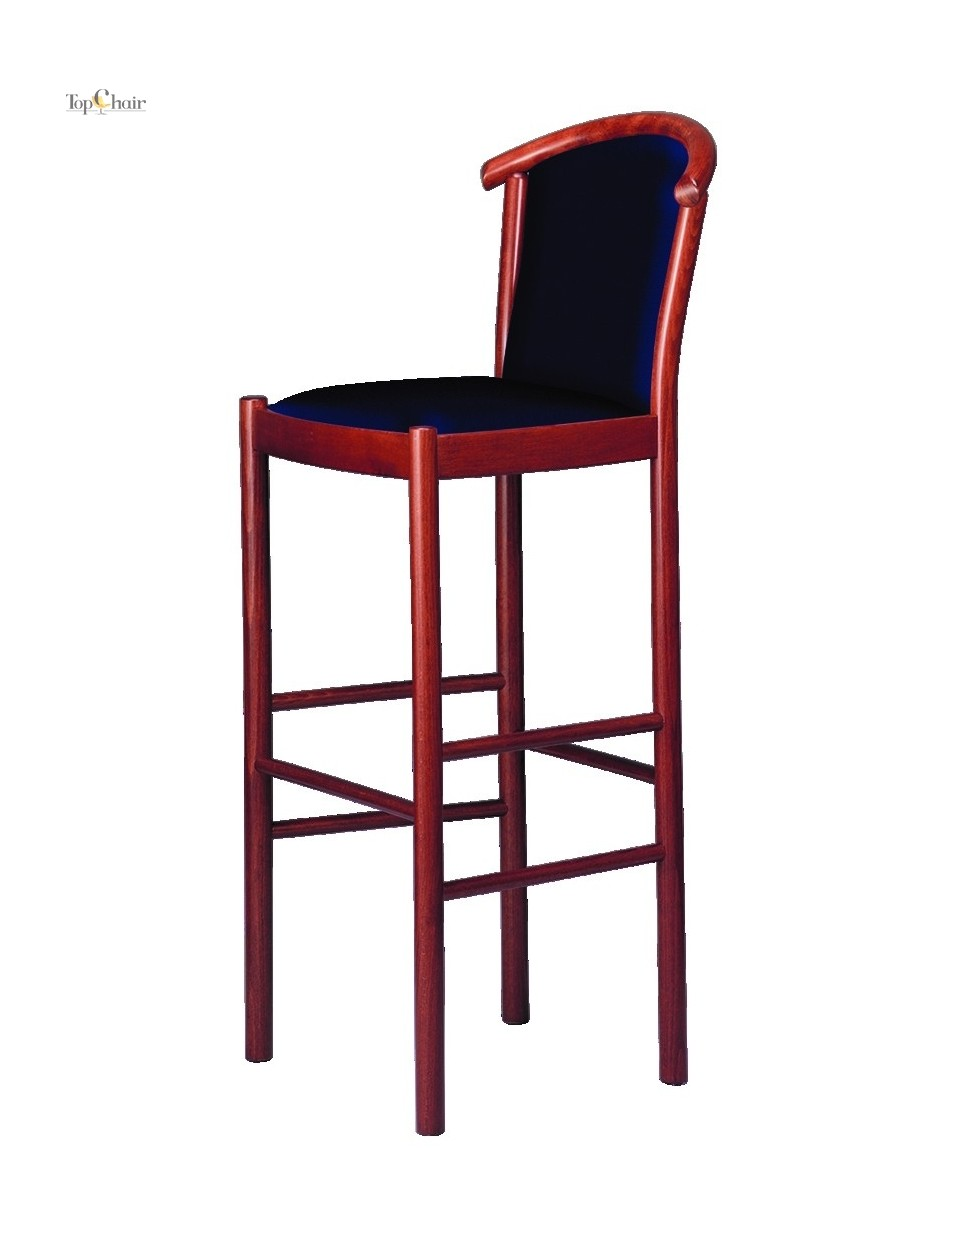 drvena-barska-stolica-c09-sg